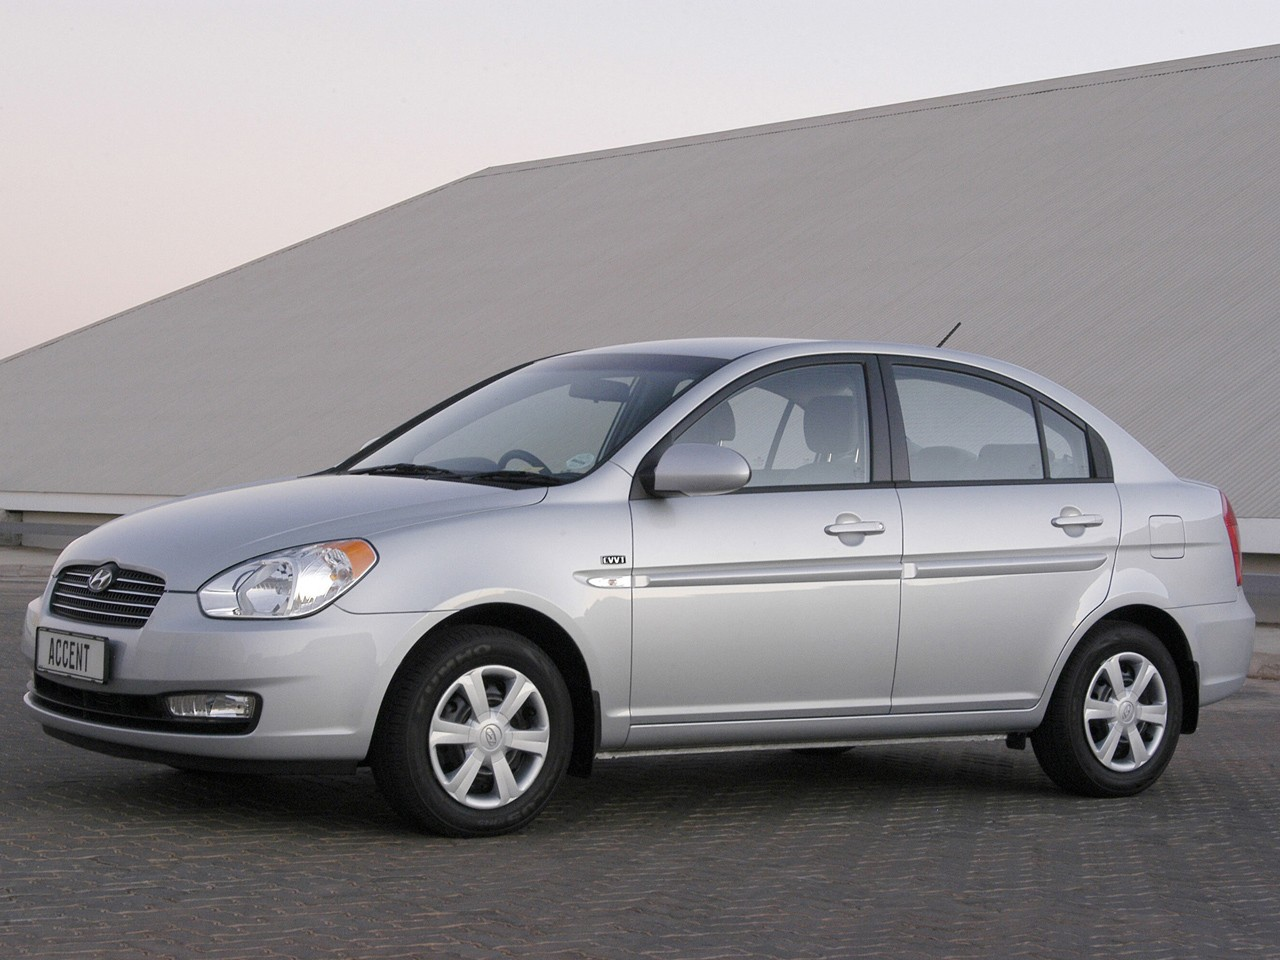 Hyundai Accent 4 Doors 2006 2007 2008 2009 2010